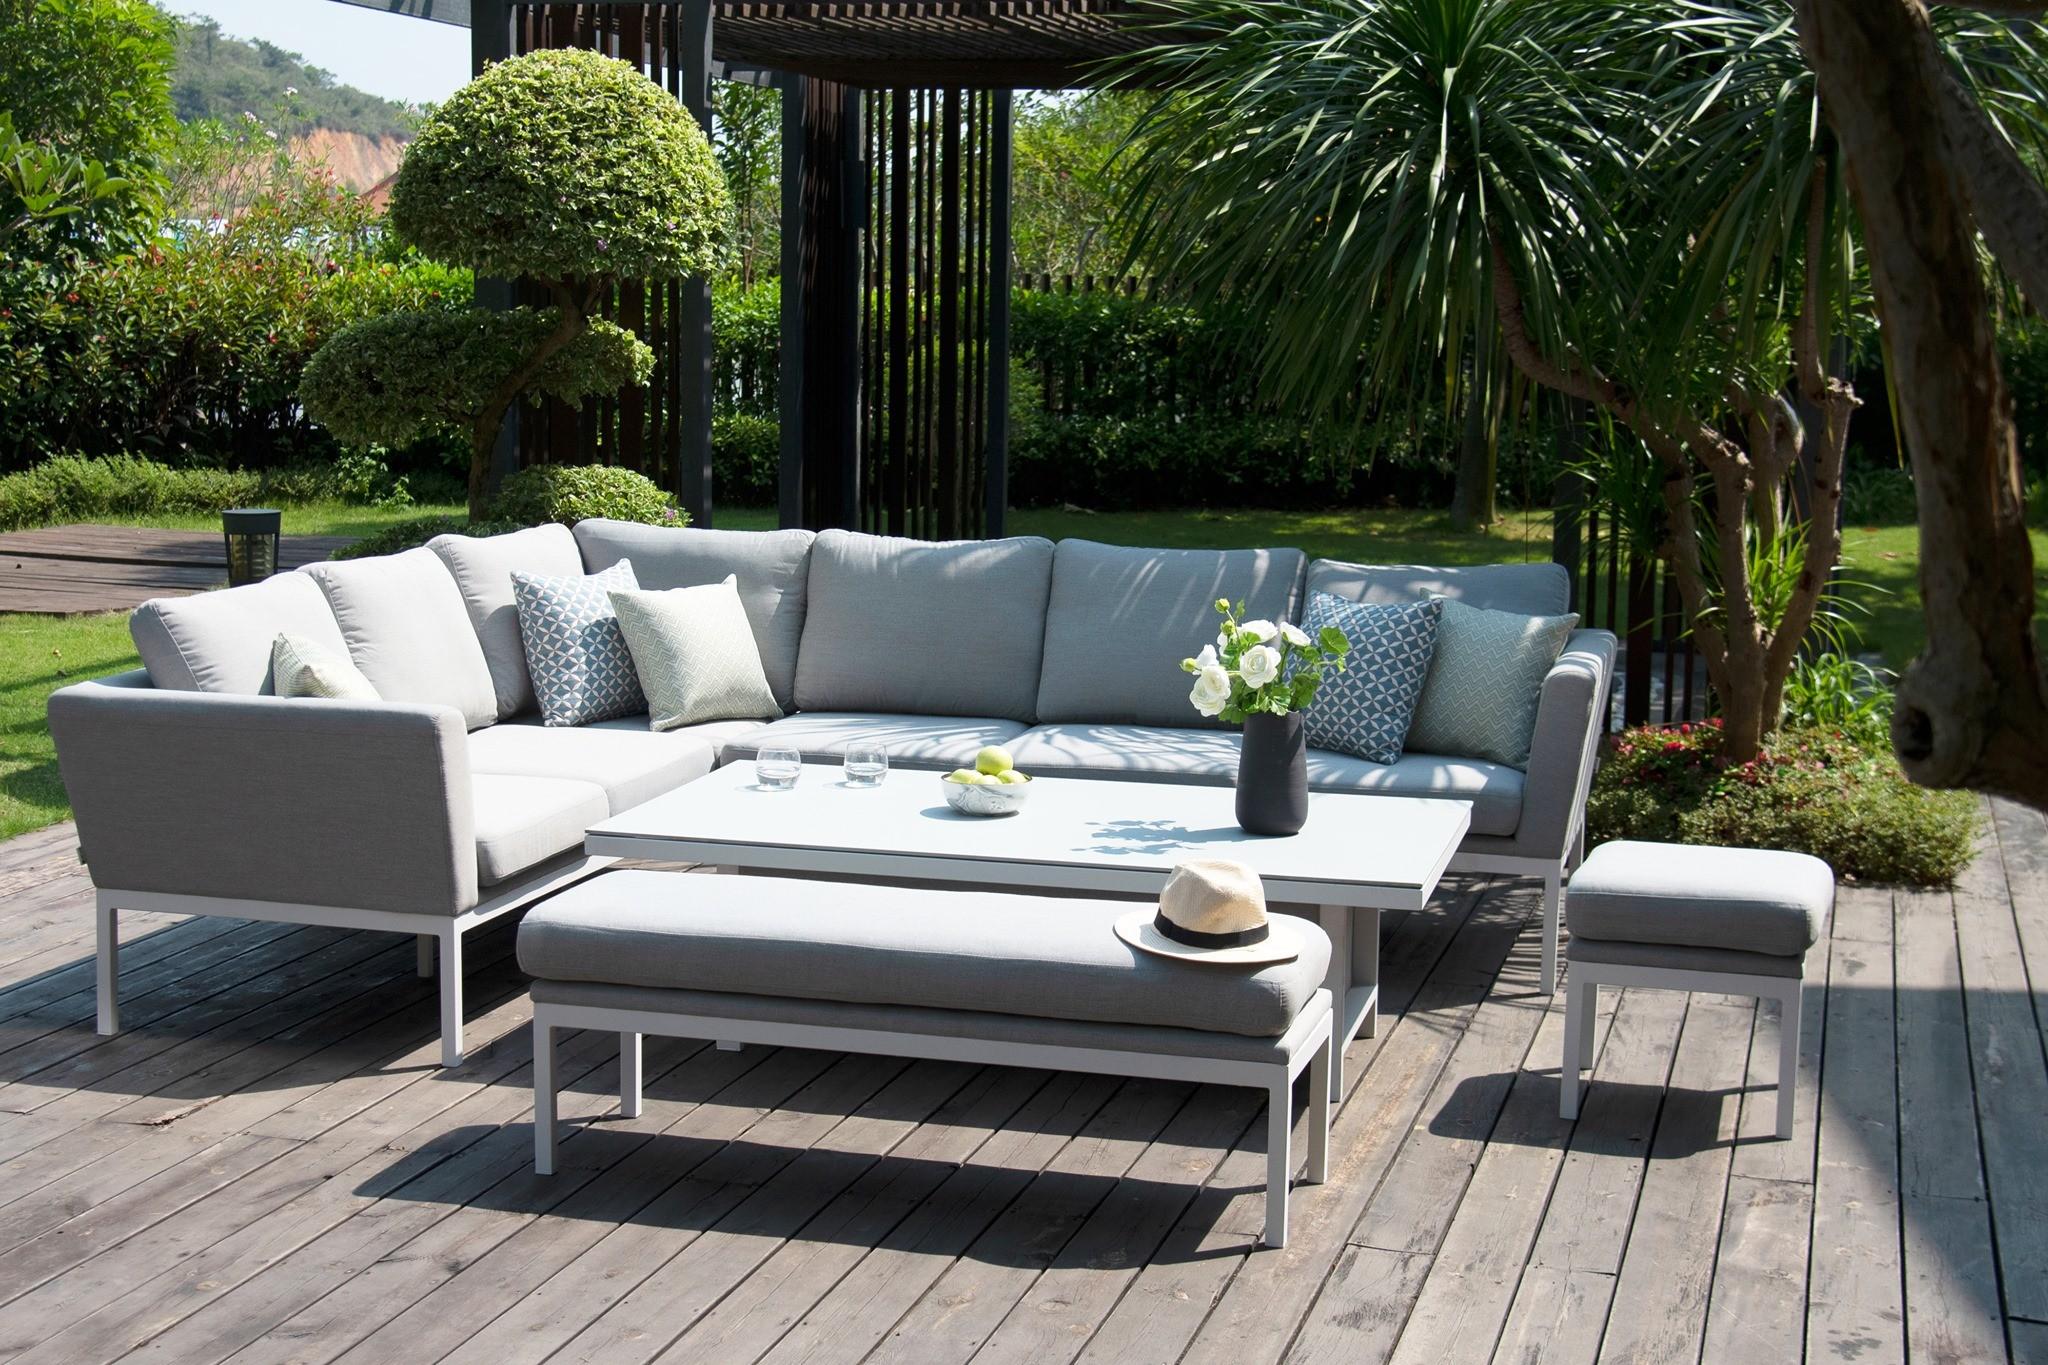 Maze Rattan Outdoor Furniture Supplier  LinkedIn